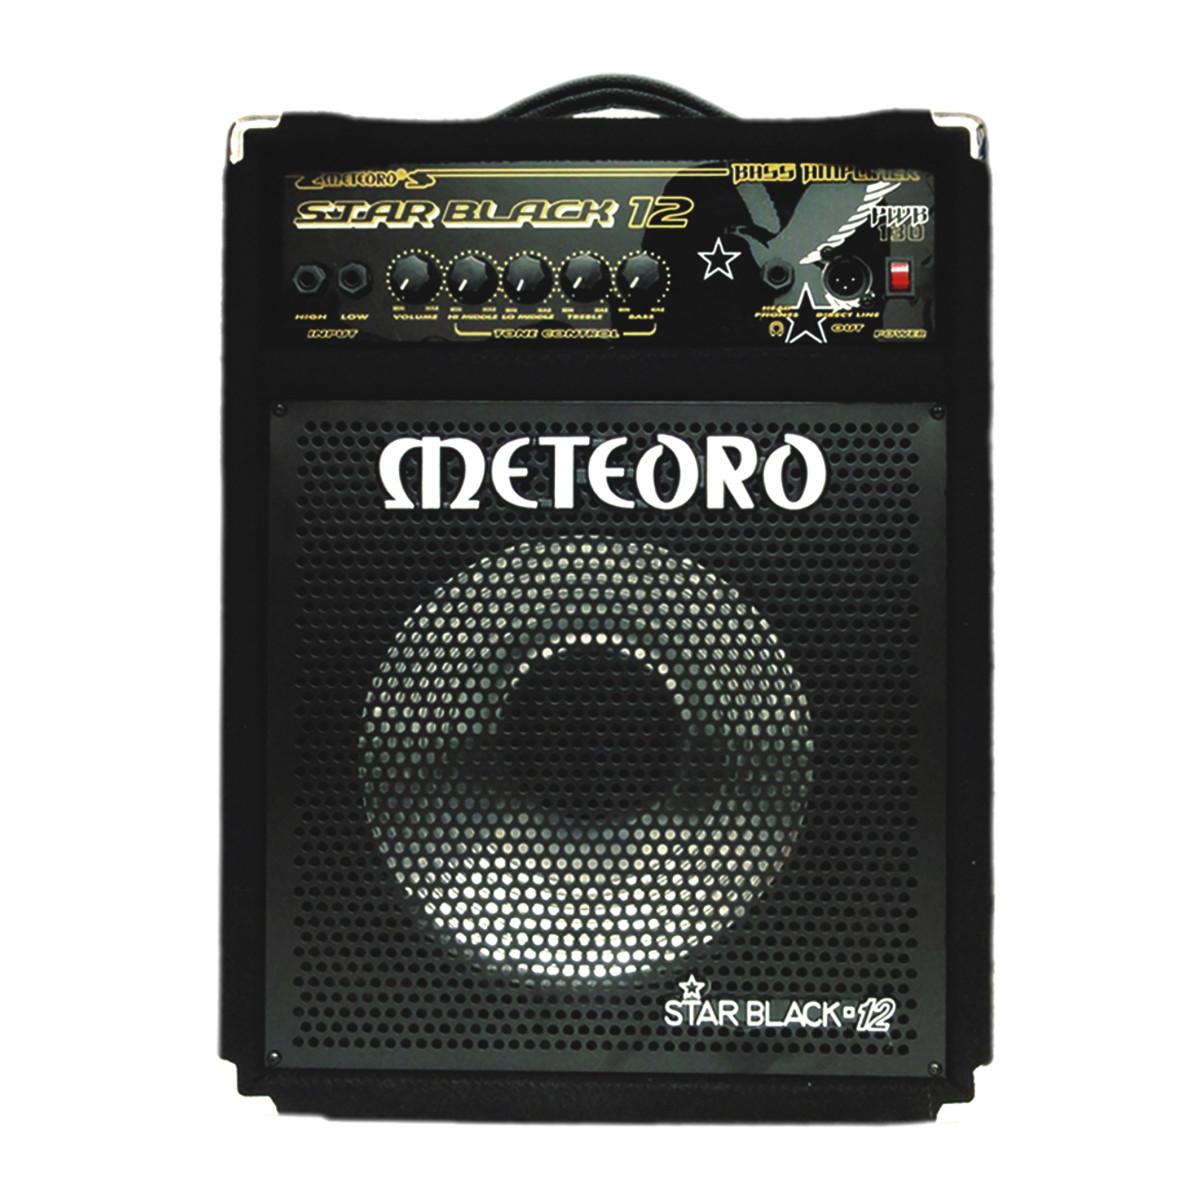 Amplificador Meteoro para Contra Baixo Star Black 12